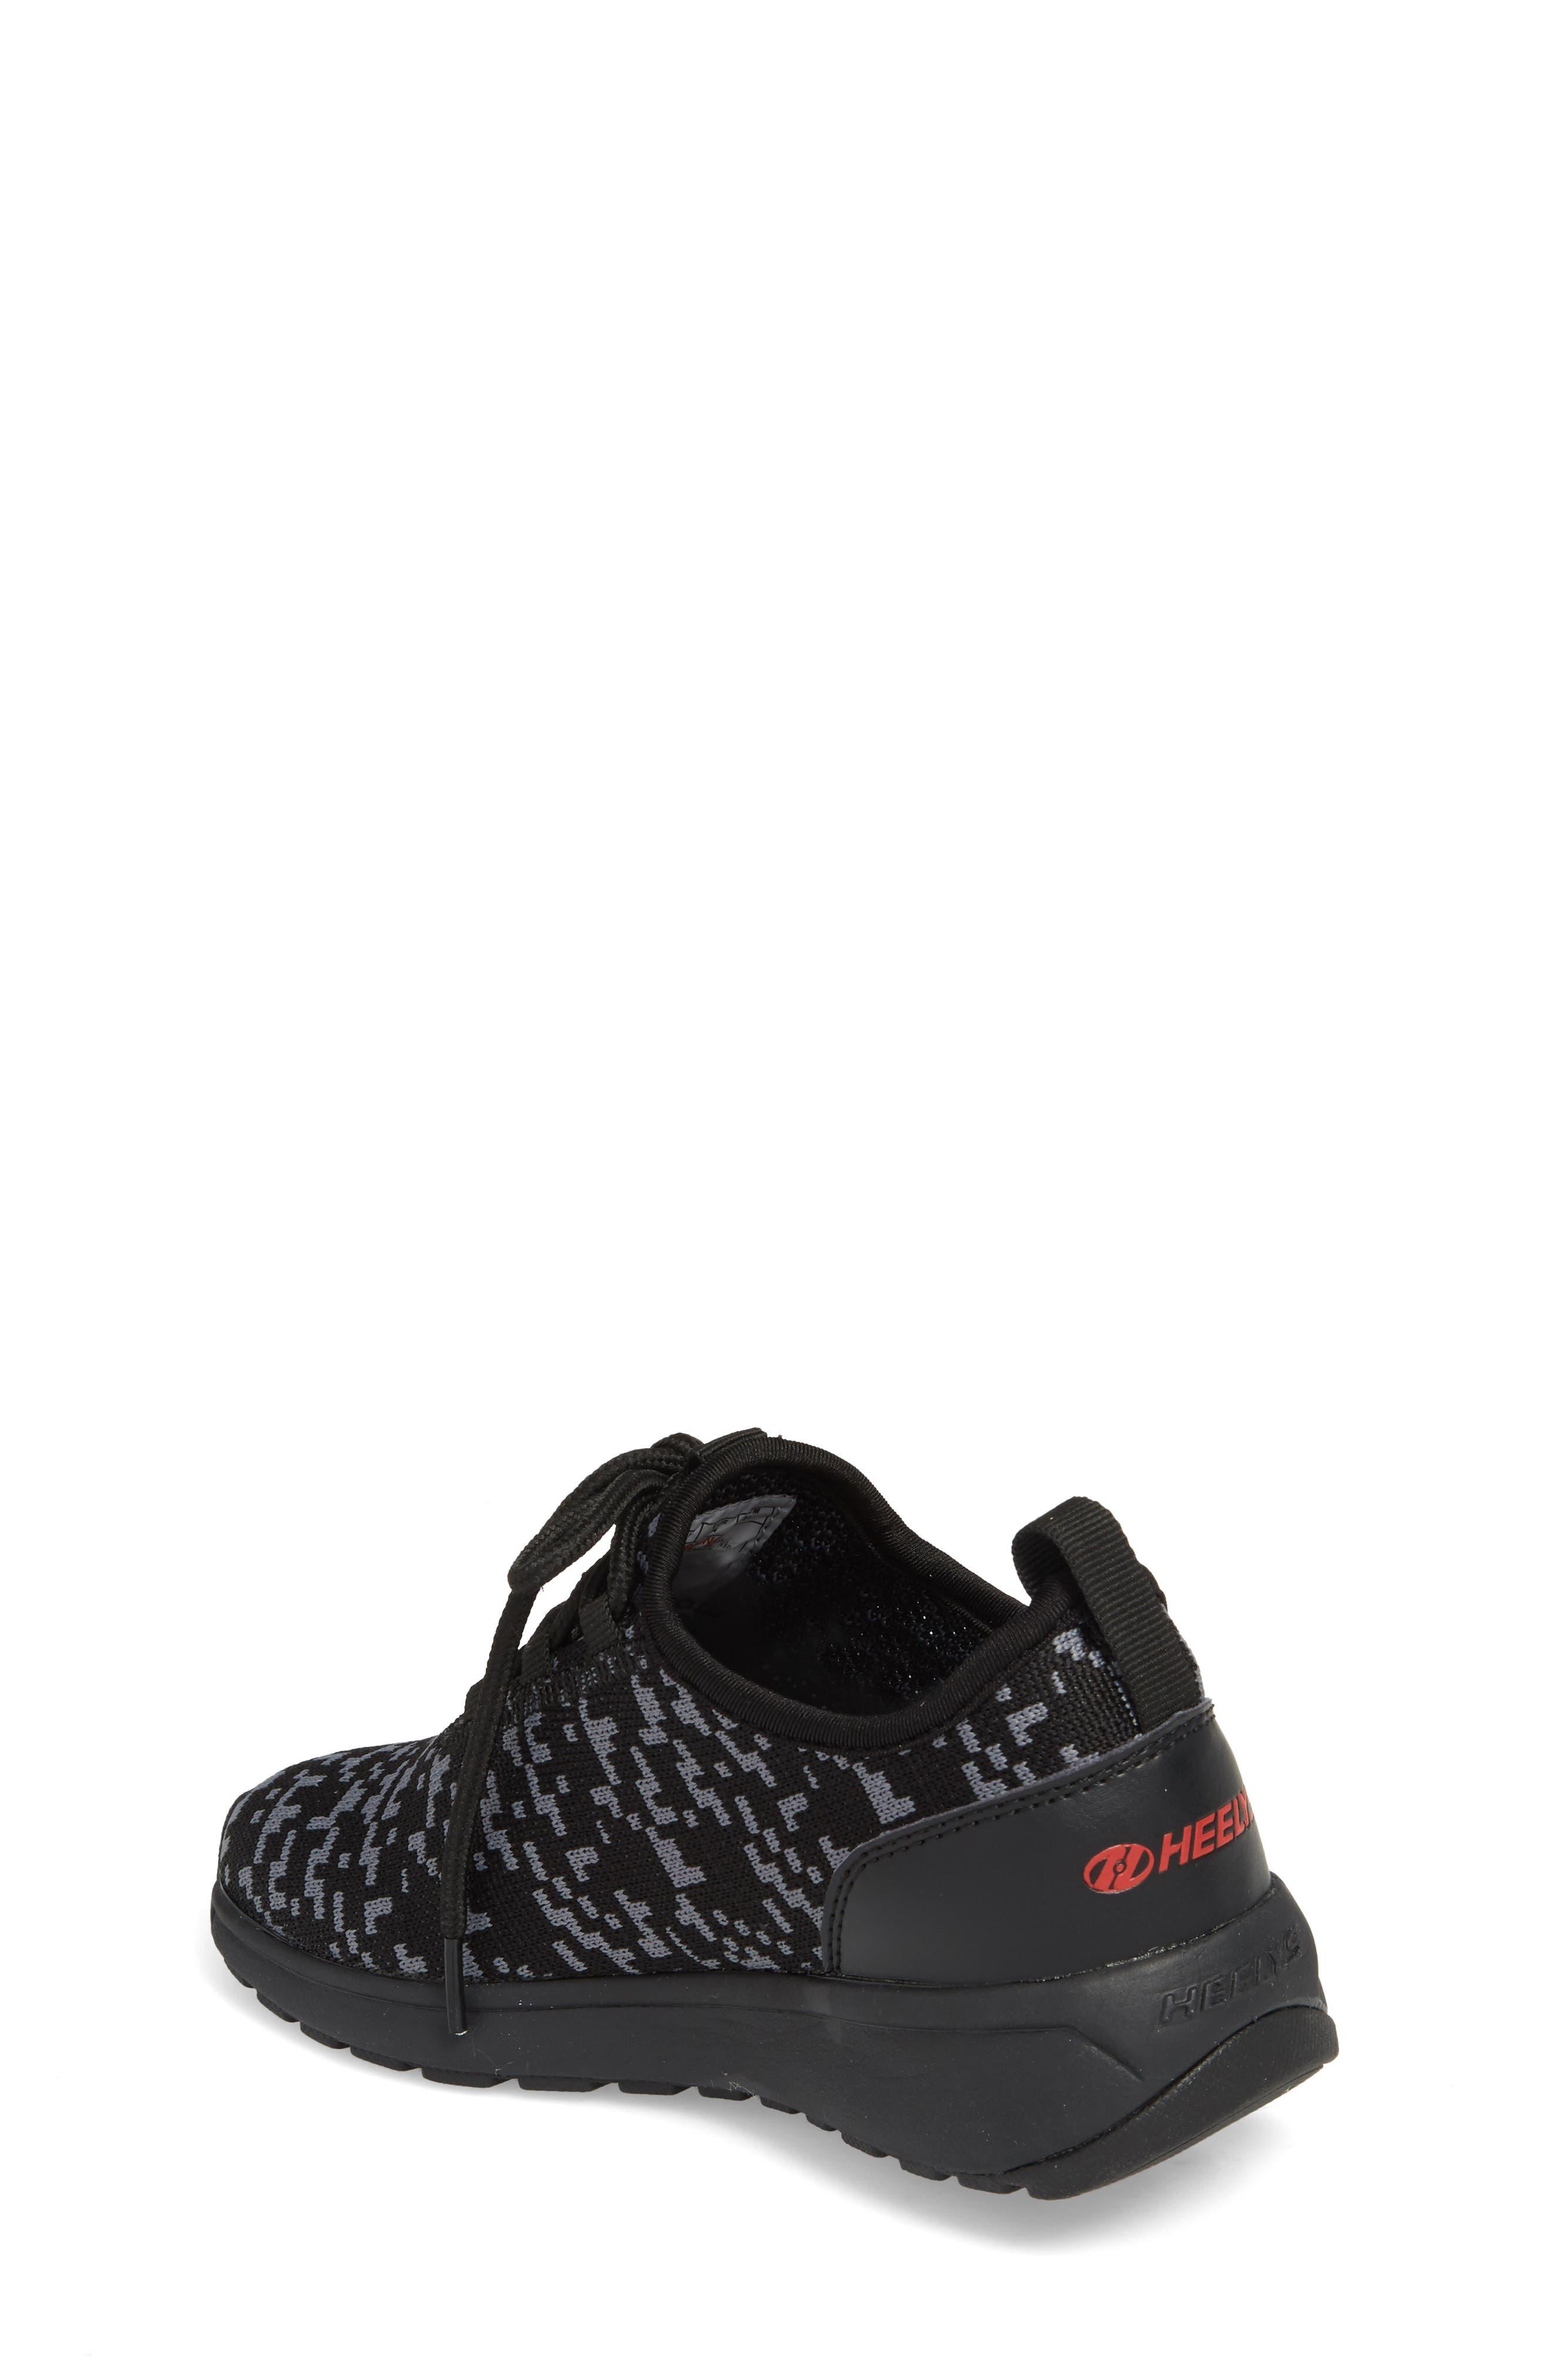 Player Sneaker,                             Alternate thumbnail 2, color,                             Black/ Red